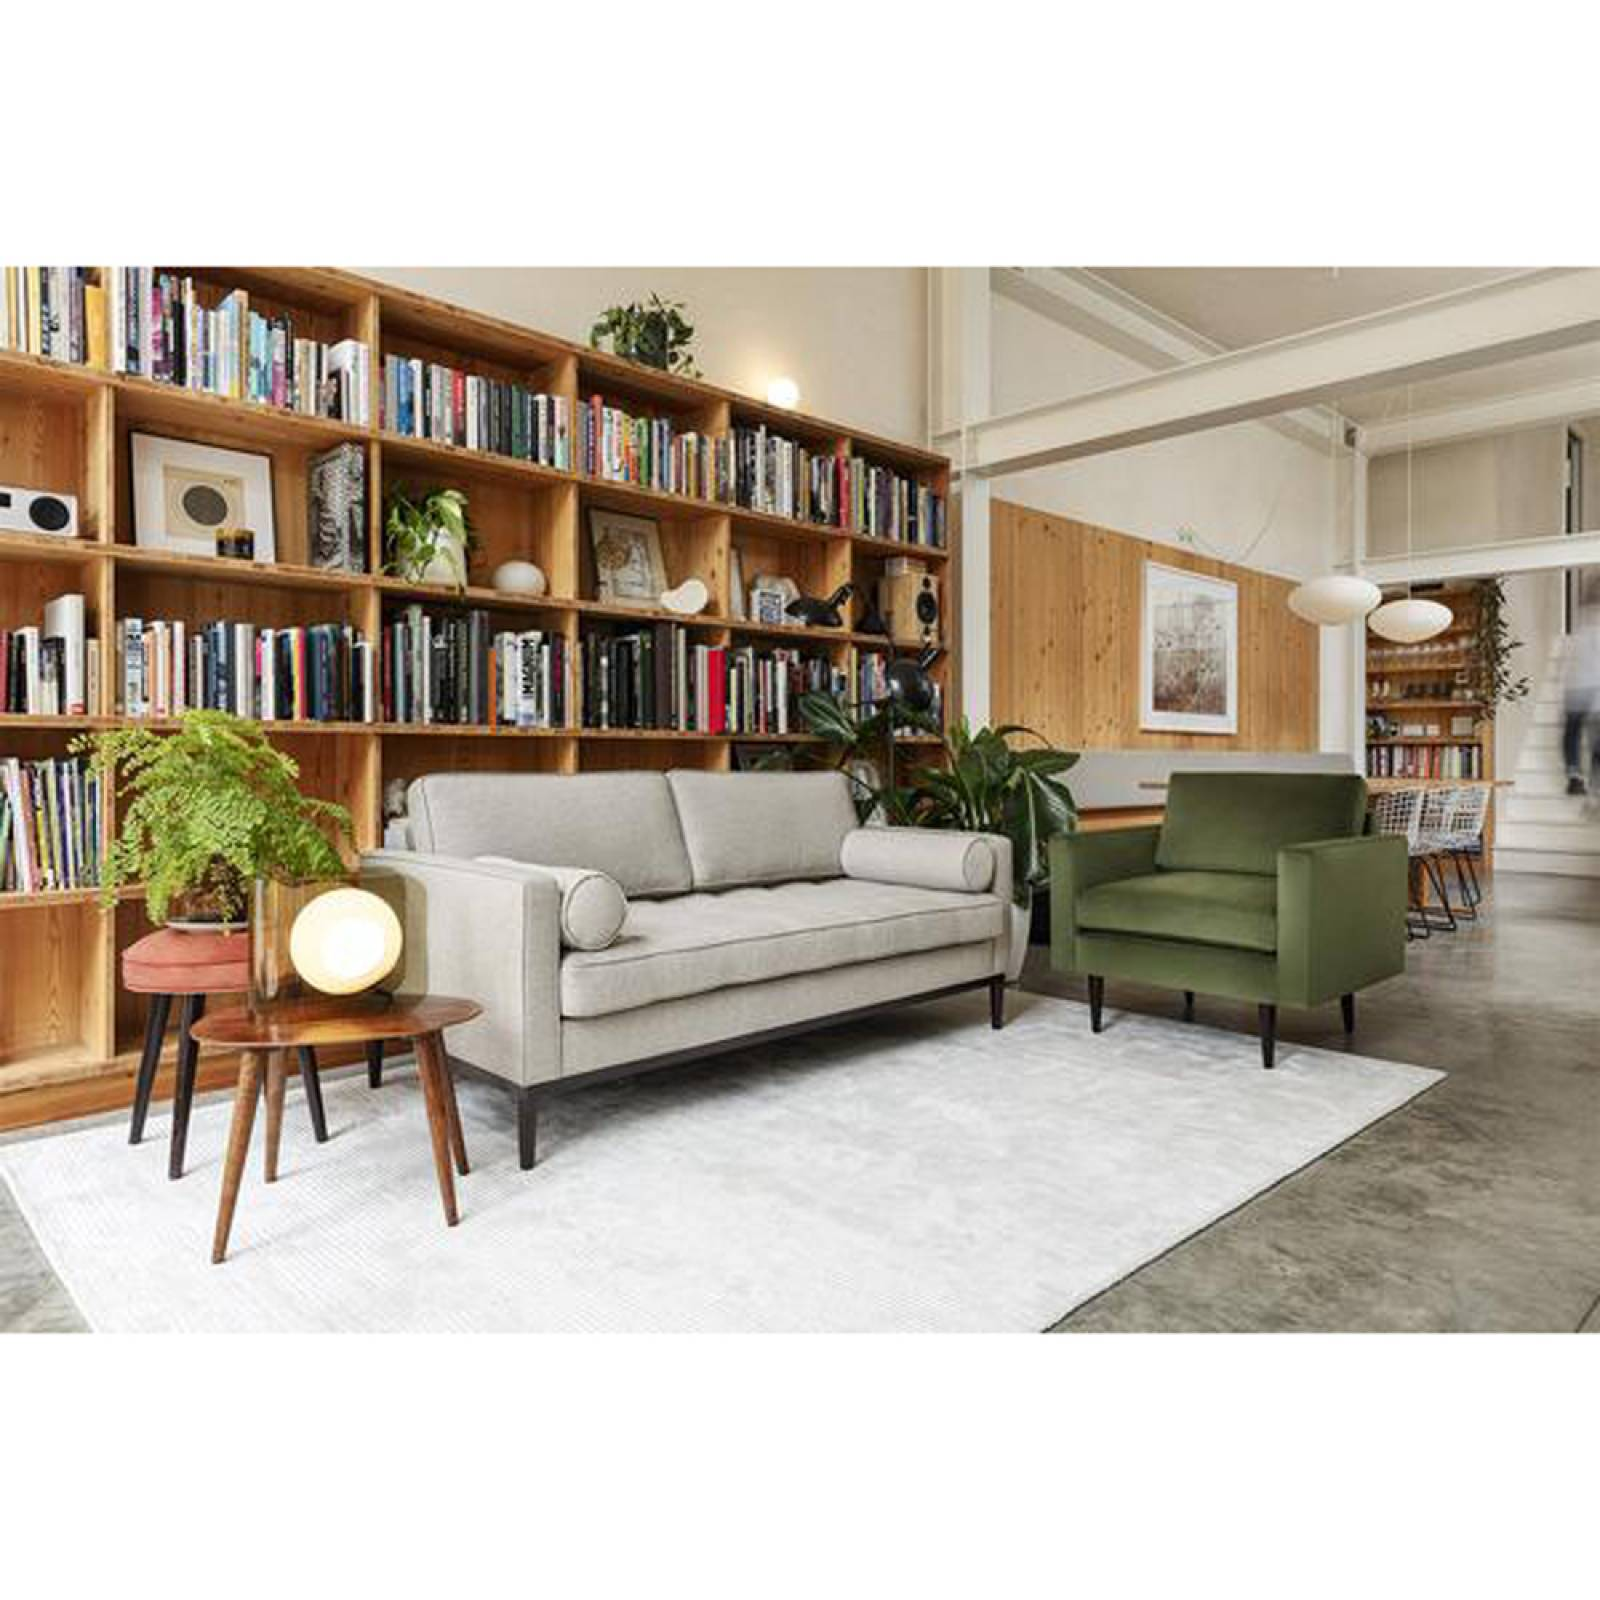 Swyft - Model 02 Linen 3 Seater Sofa - Pumice thumbnails